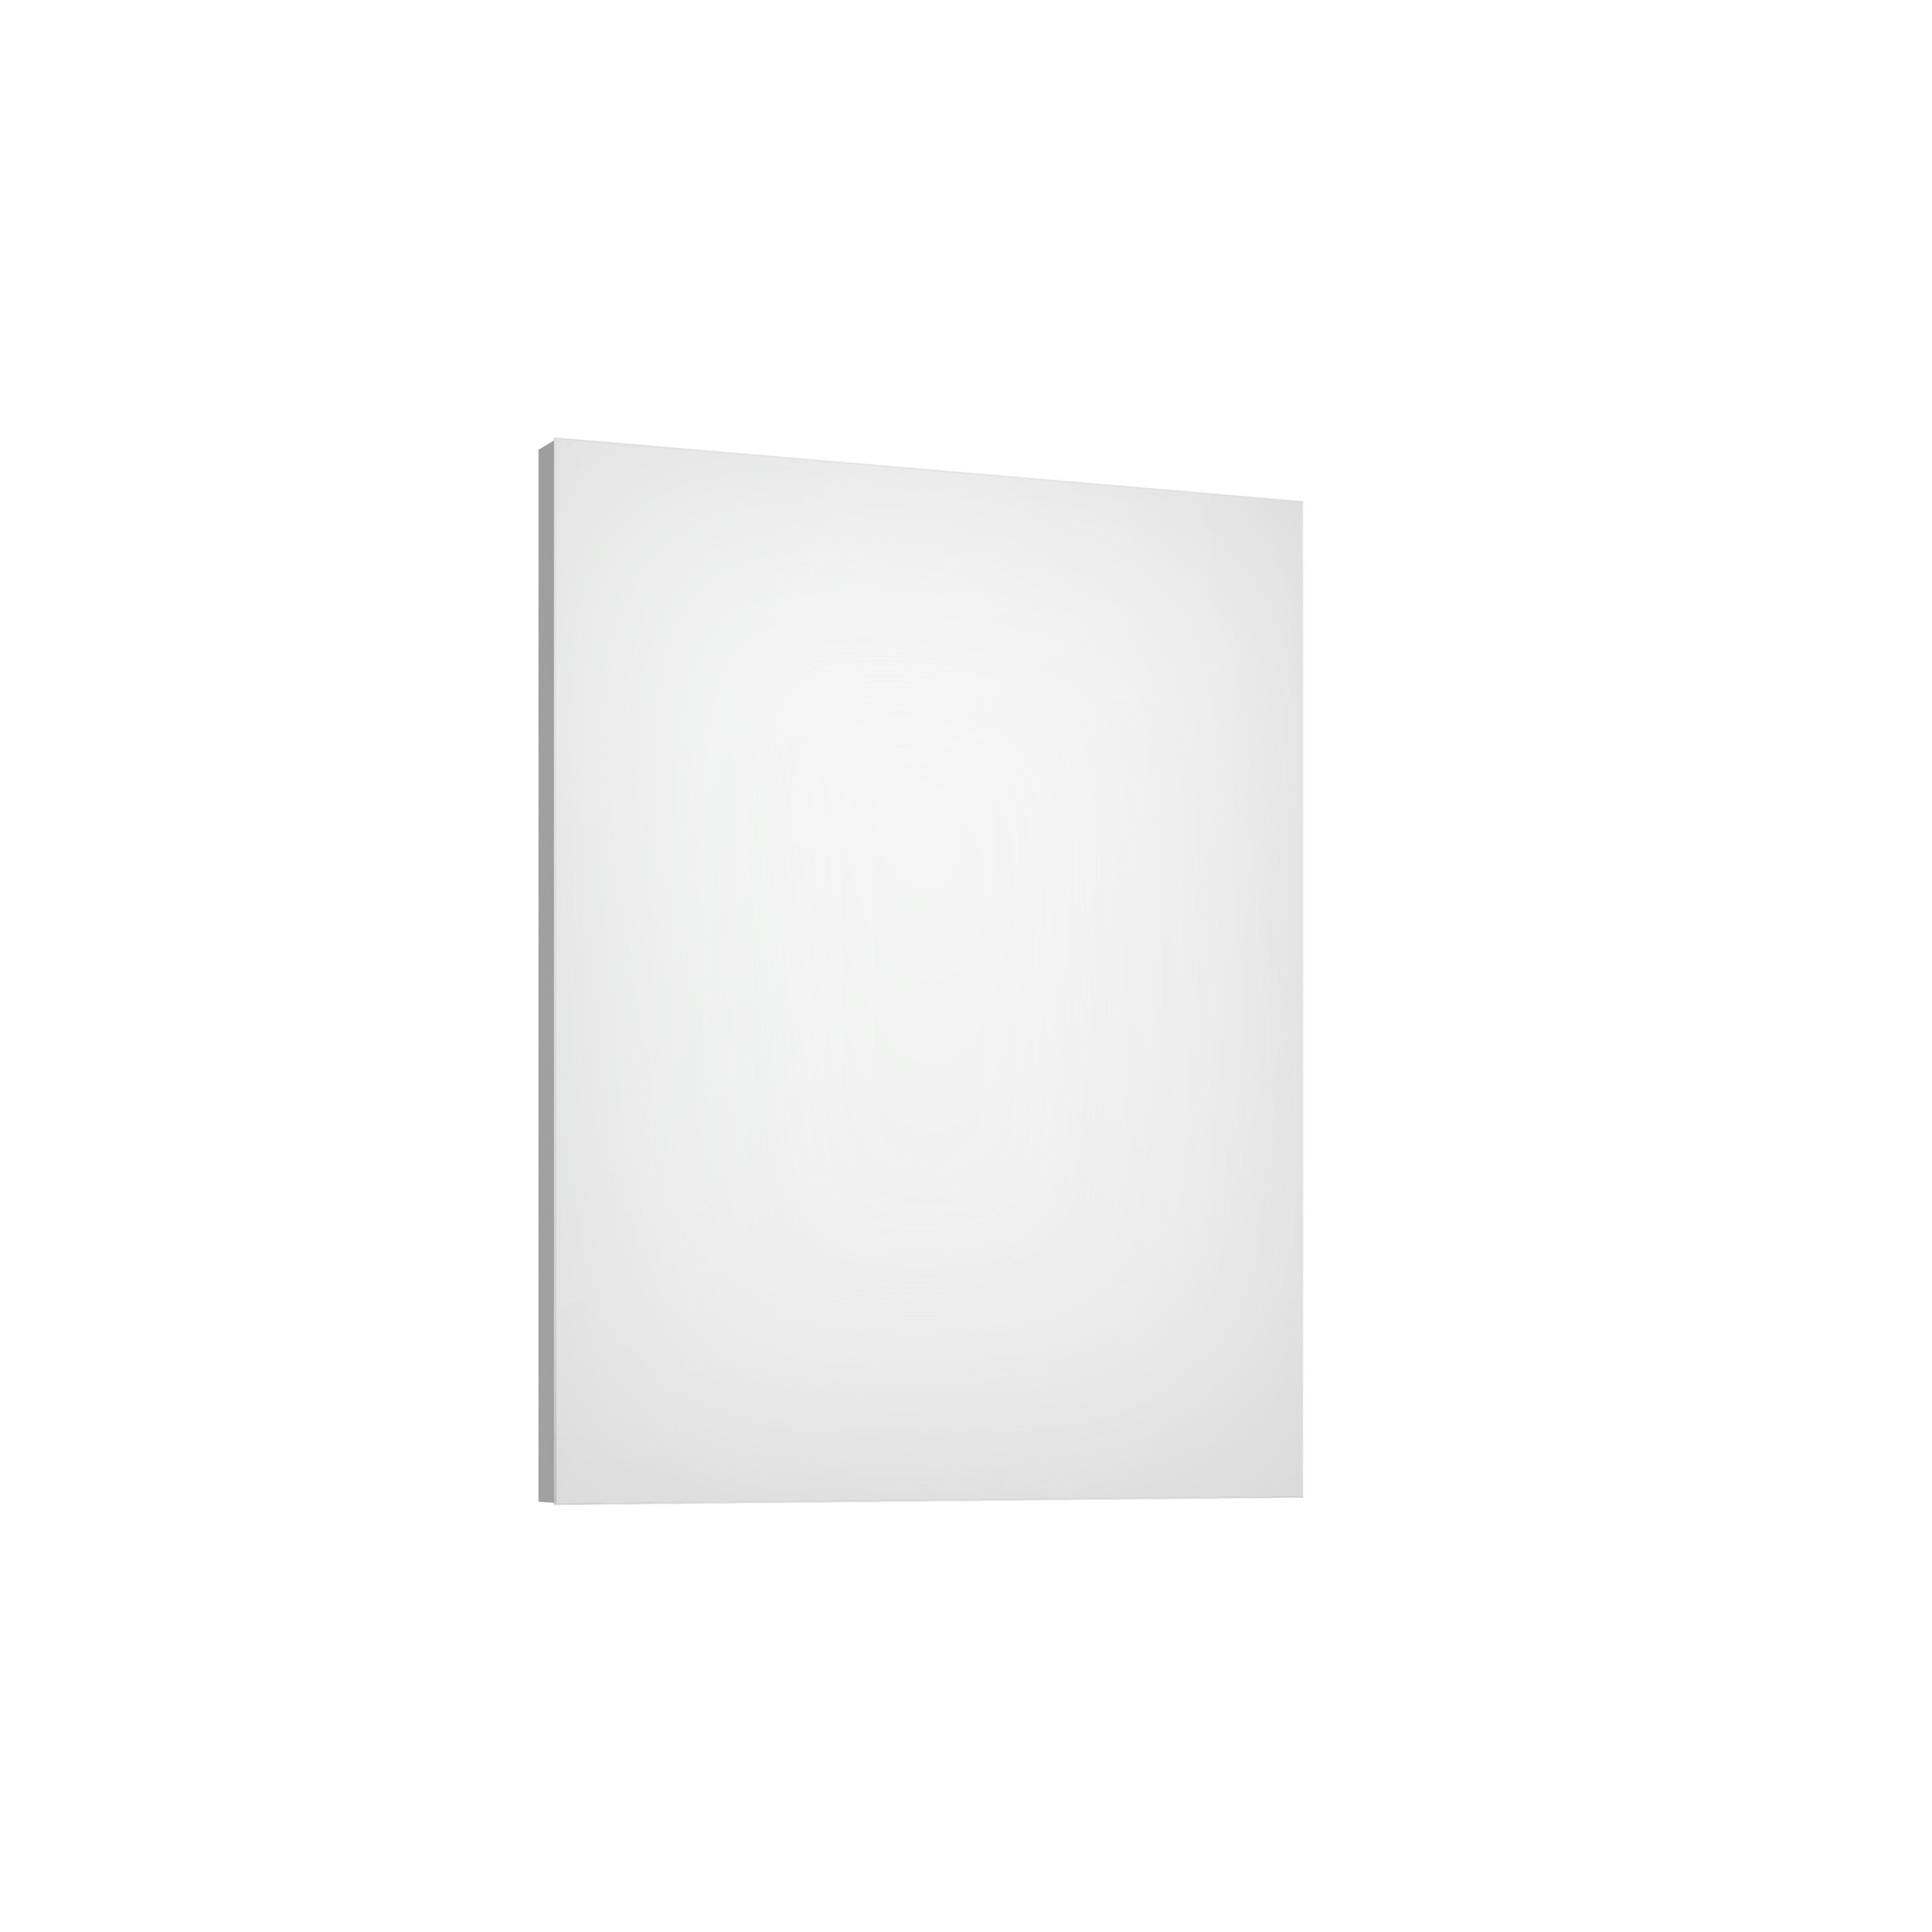 Lustro Defra Como L60/80 Biały Mat 60×76×4,2 76×60×4,2 cm 123-L-06024